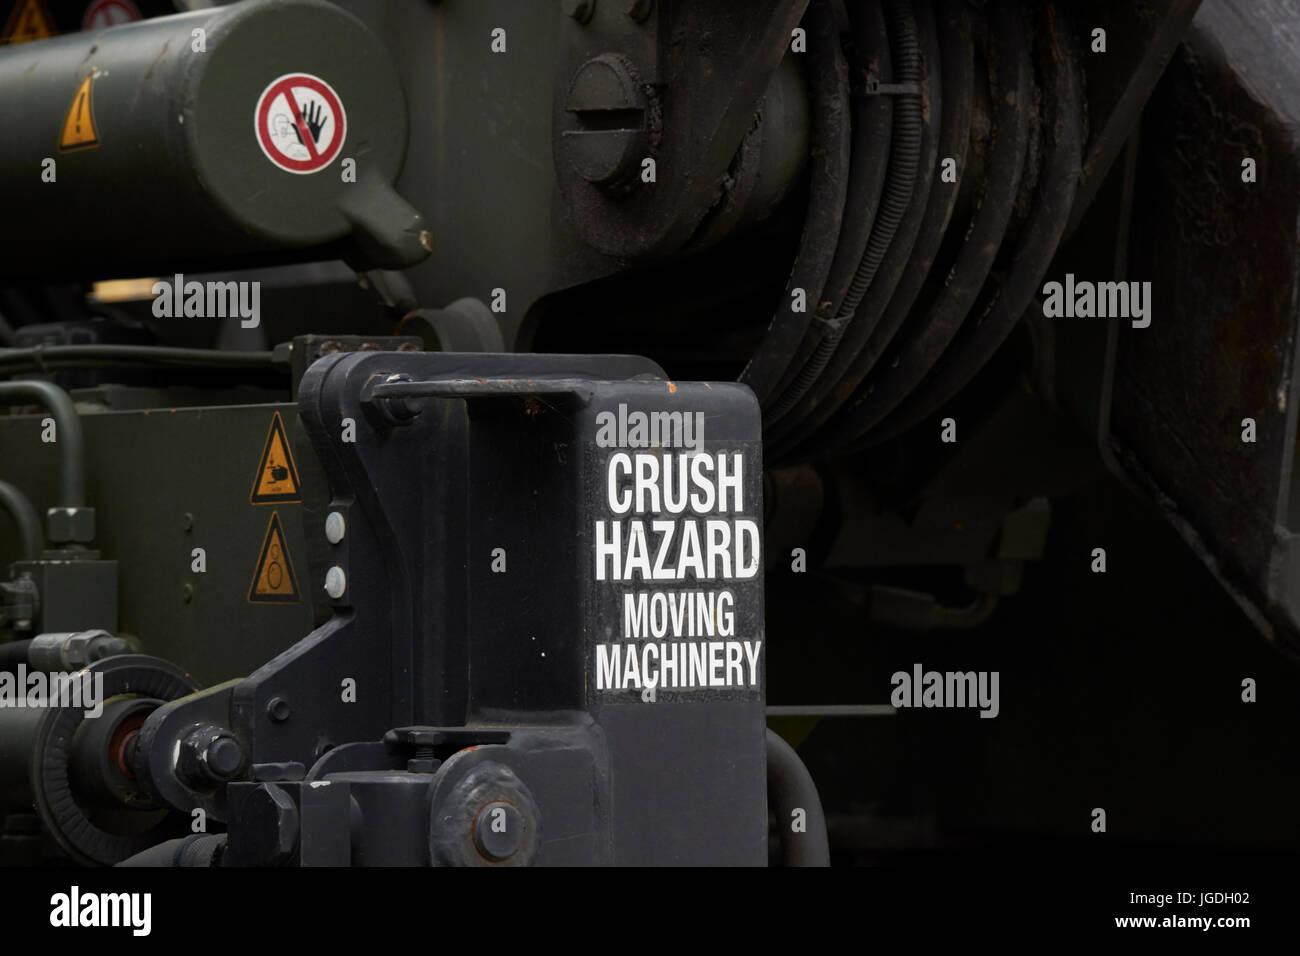 crush hazard moving machinery warning notice british army heavy lift vehicle uk - Stock Image